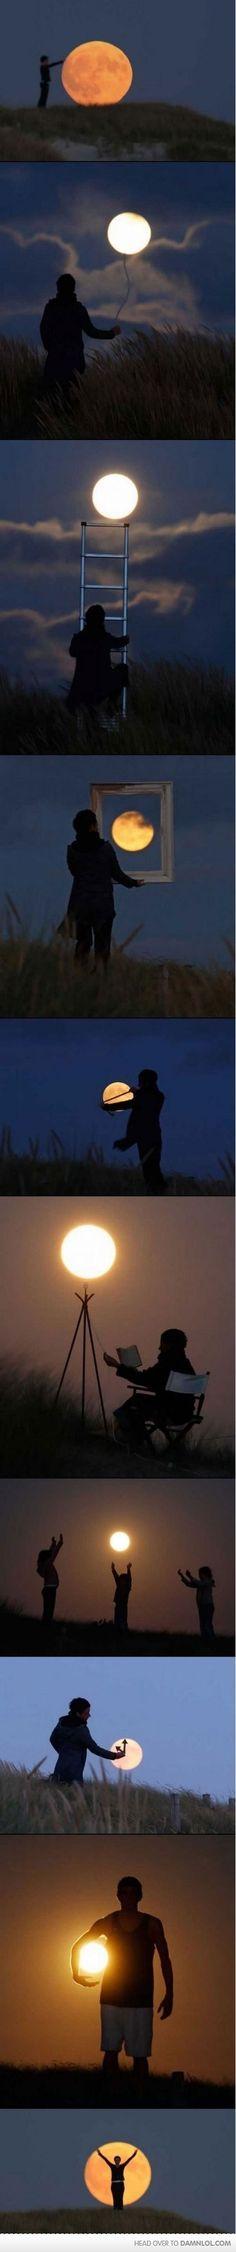 creativ, idea, moon, favorit photographi, art, beauti, fun, awesom, phase